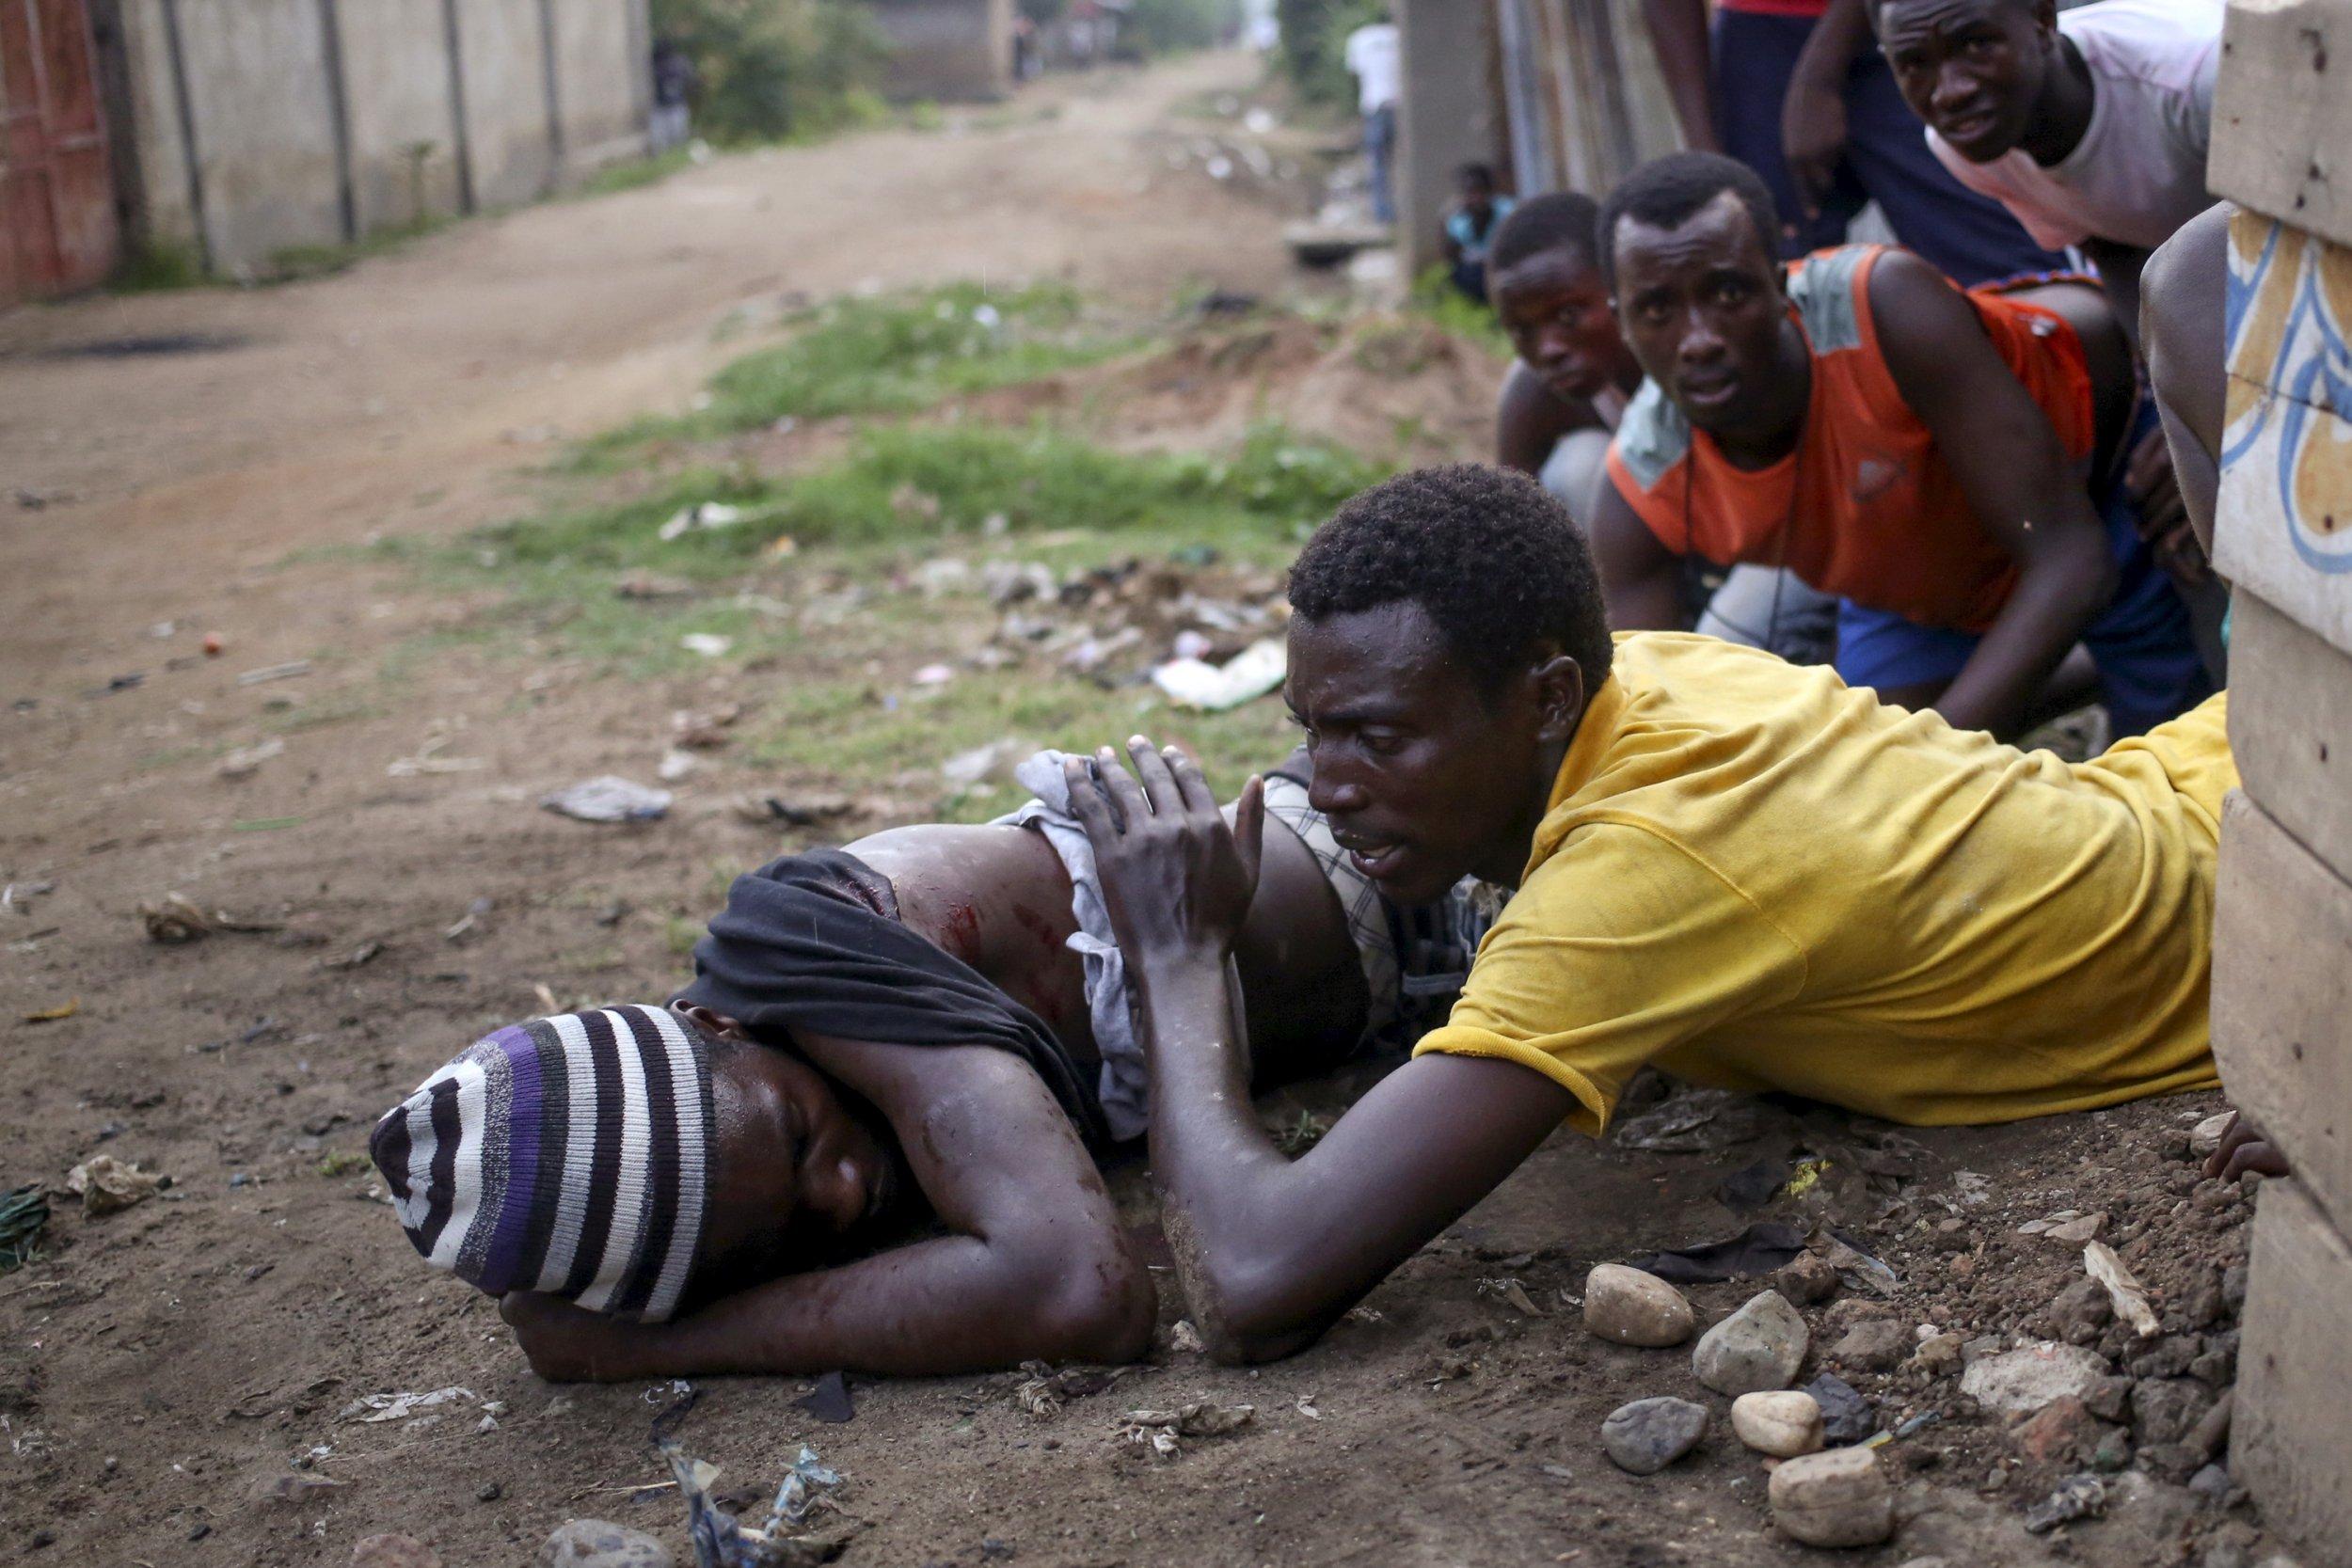 An anti-Nkurunziza protester lies wounded in Bujumbura, Burundi.